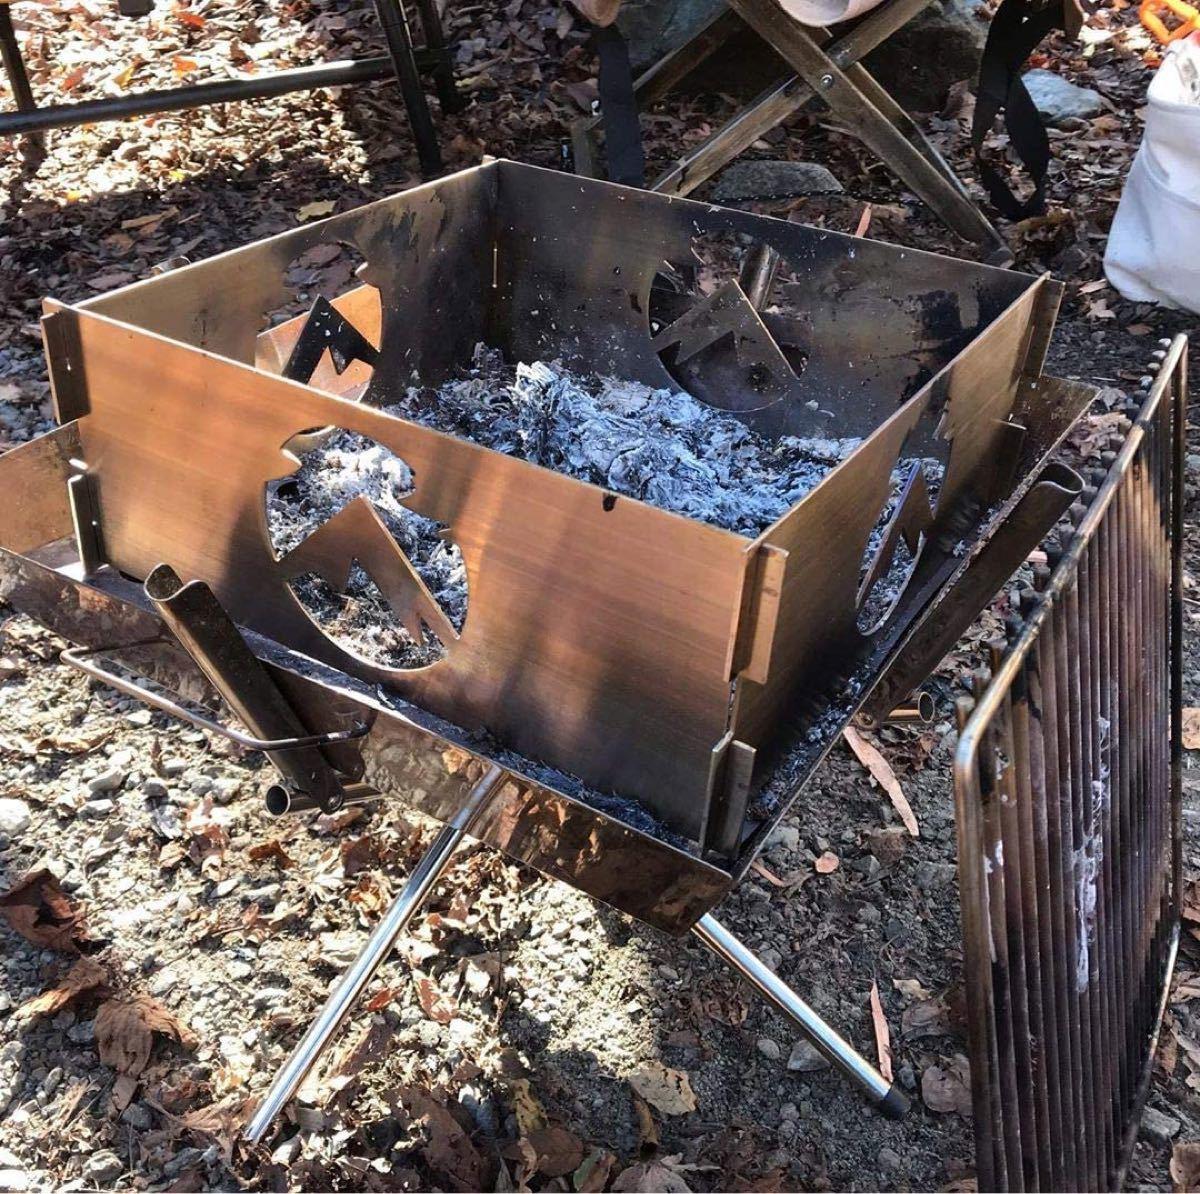 CAMPING MOONキャンピングムーン 焚き火サークルプレートLサイズ ケース付 TKB405 焚火プレート 焚火台プレート